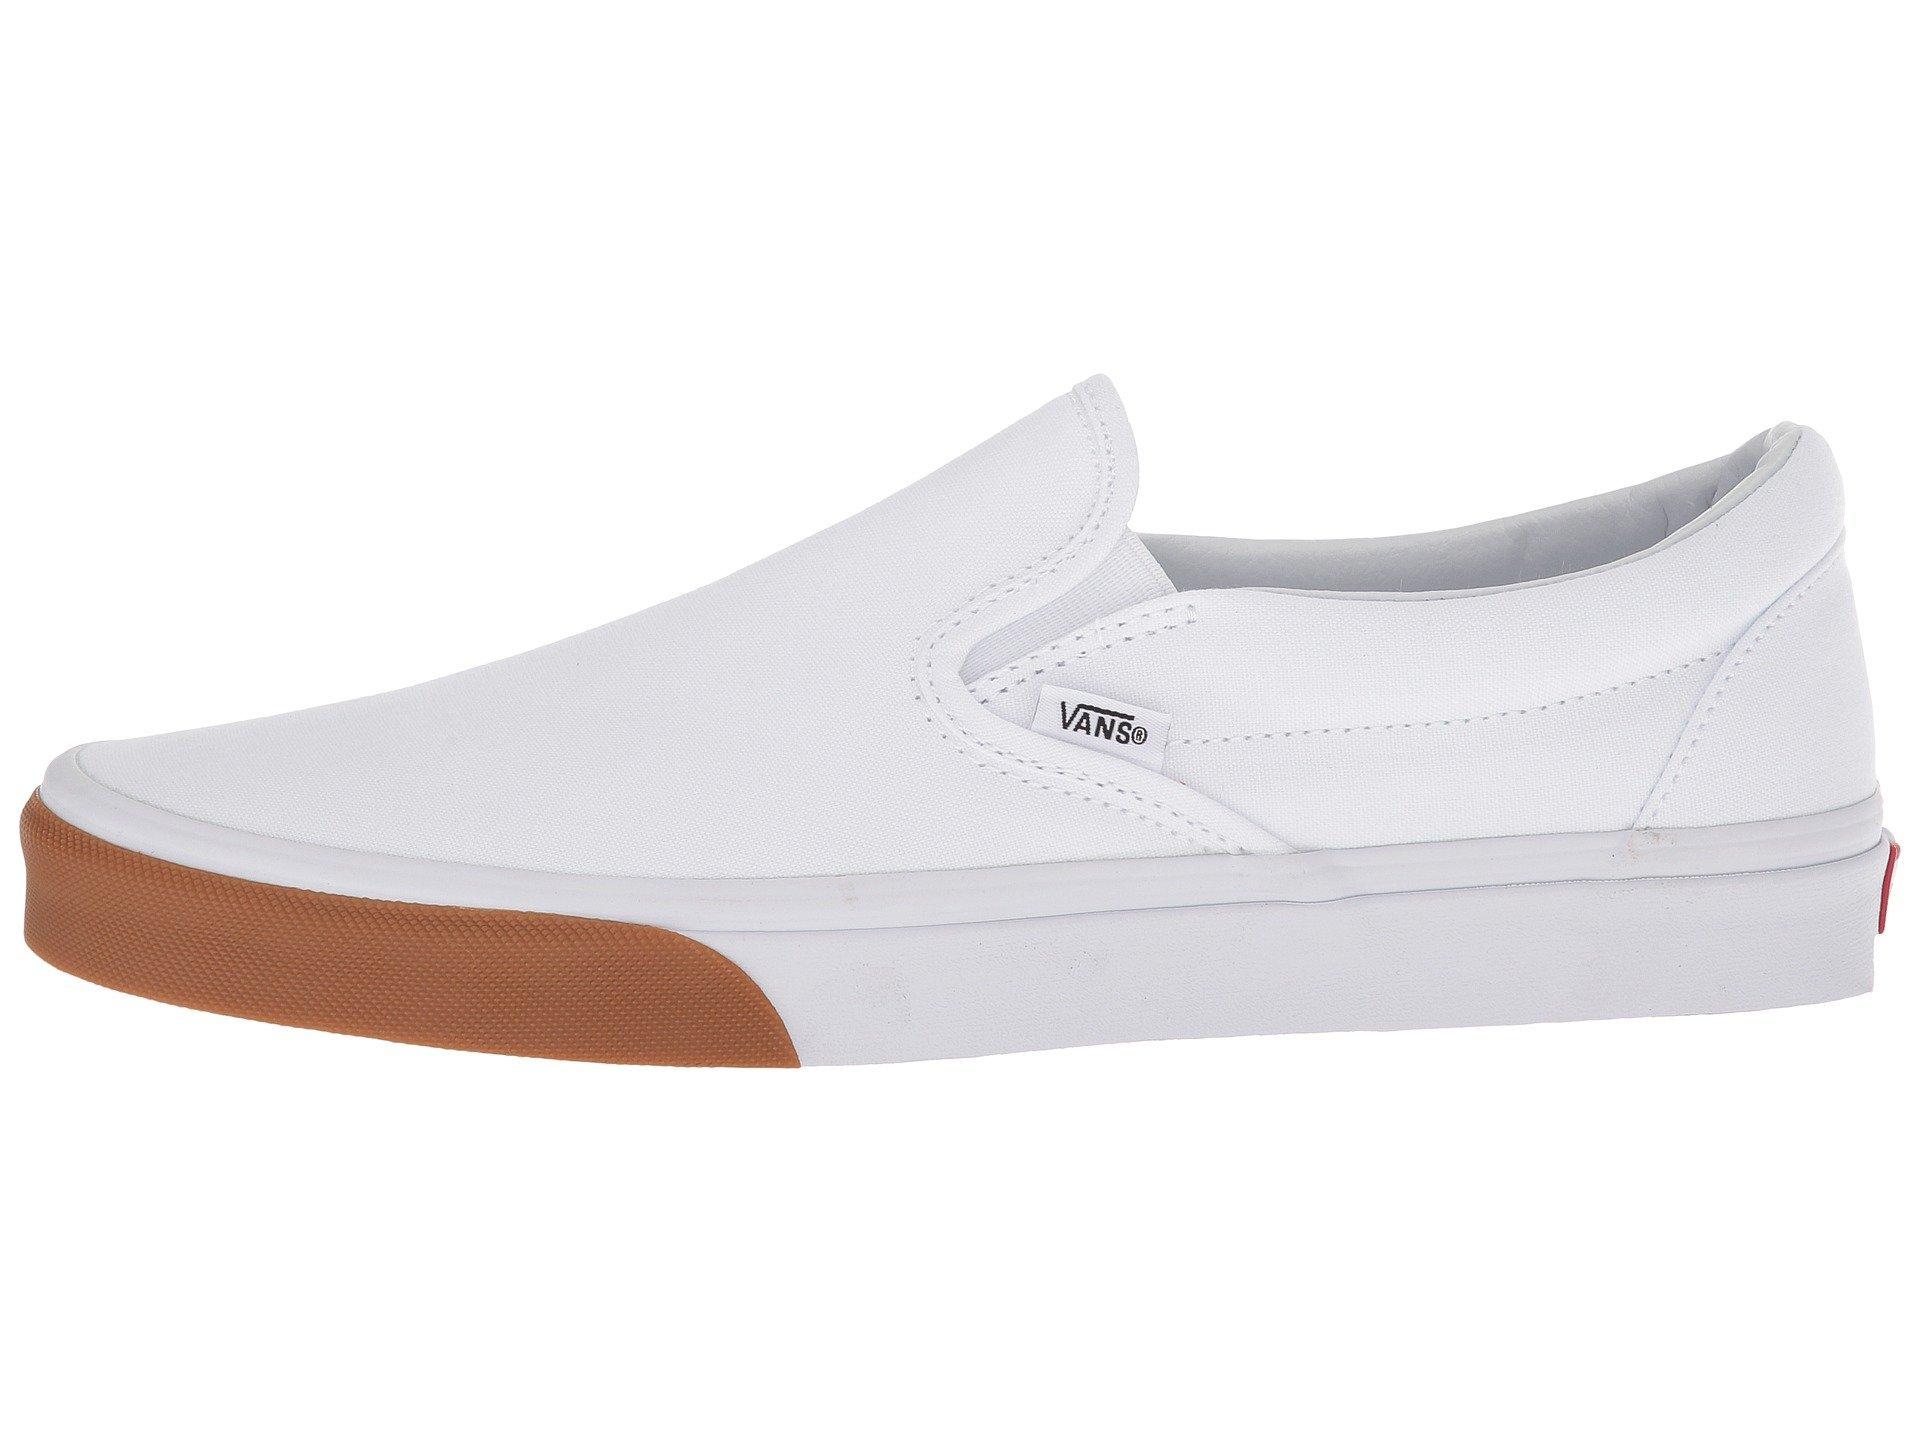 Vans Classic Slip-On Shoes (Gum Bumper) True White/True White, US Men 9/US Women 10.5